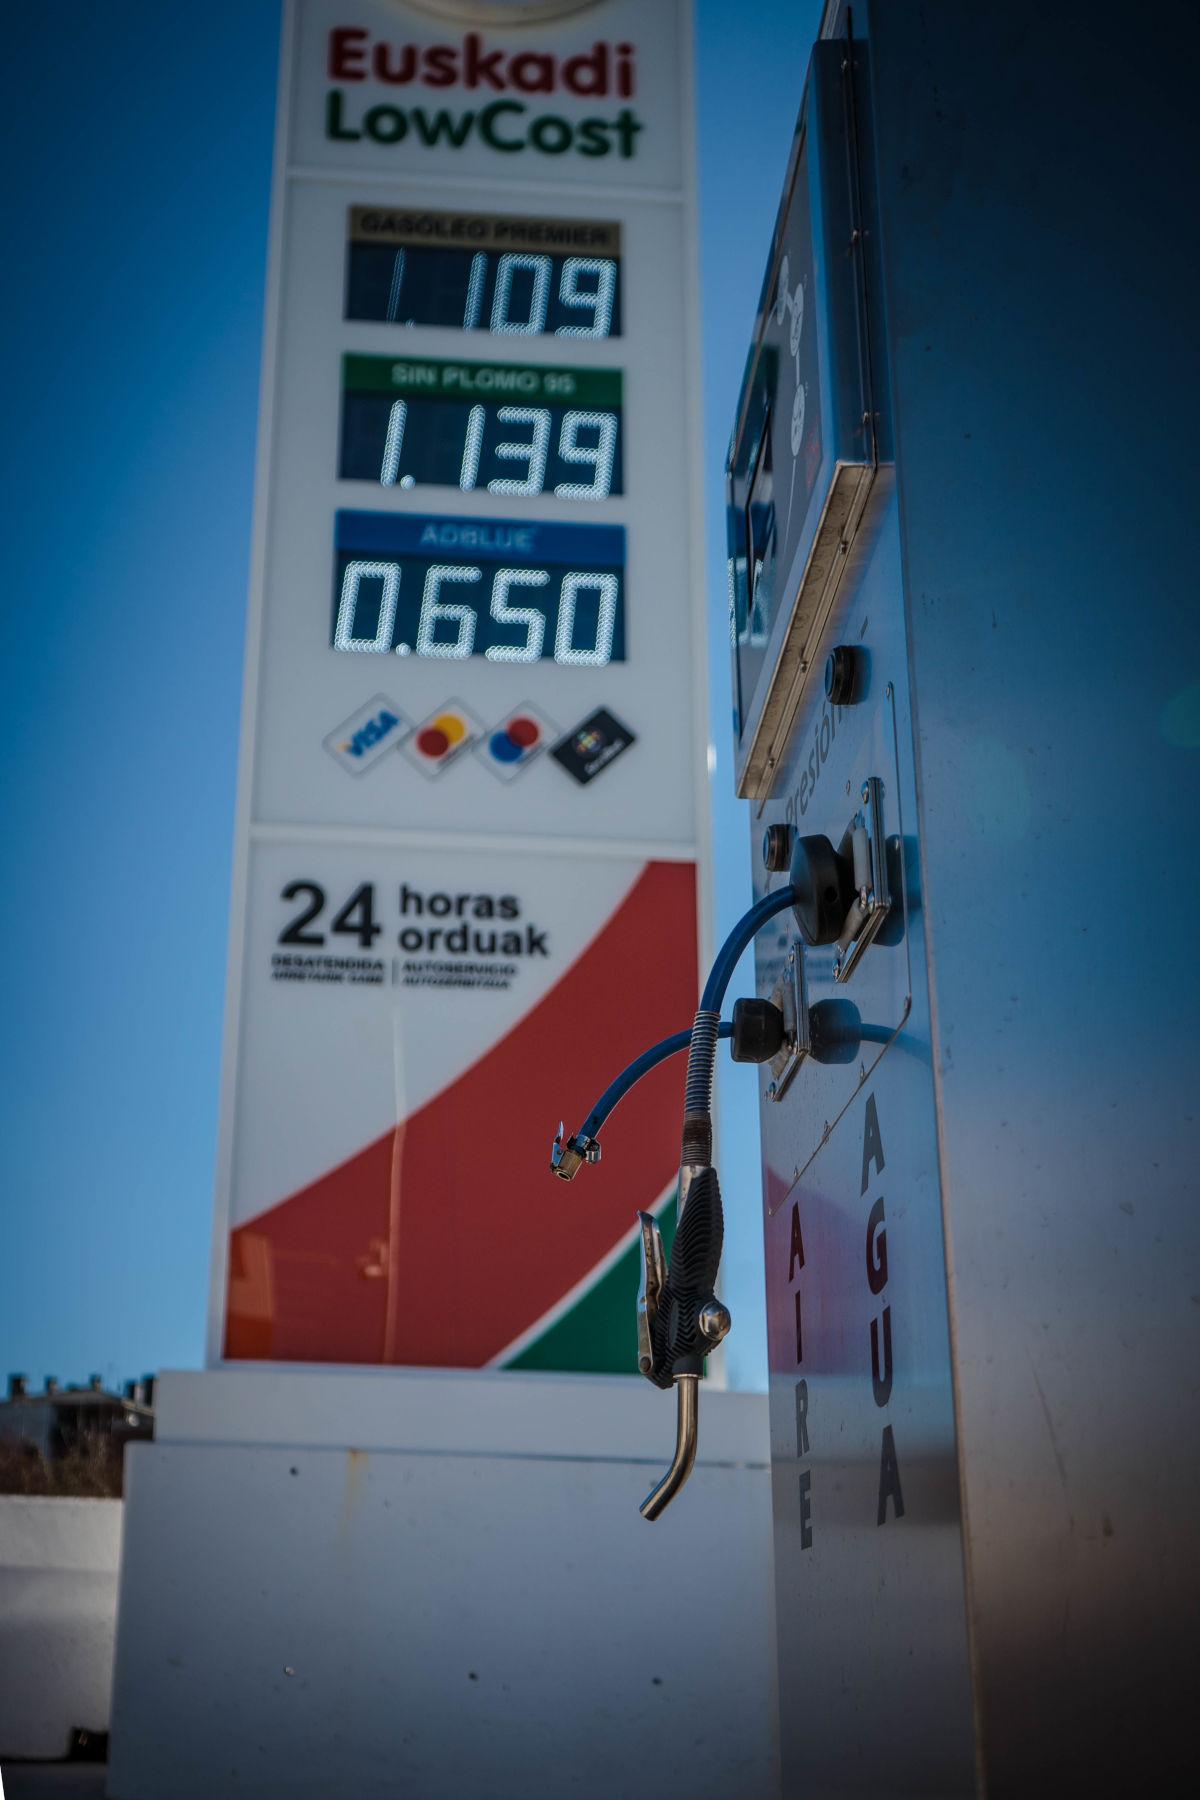 gasolinera_low_cost_lemona5